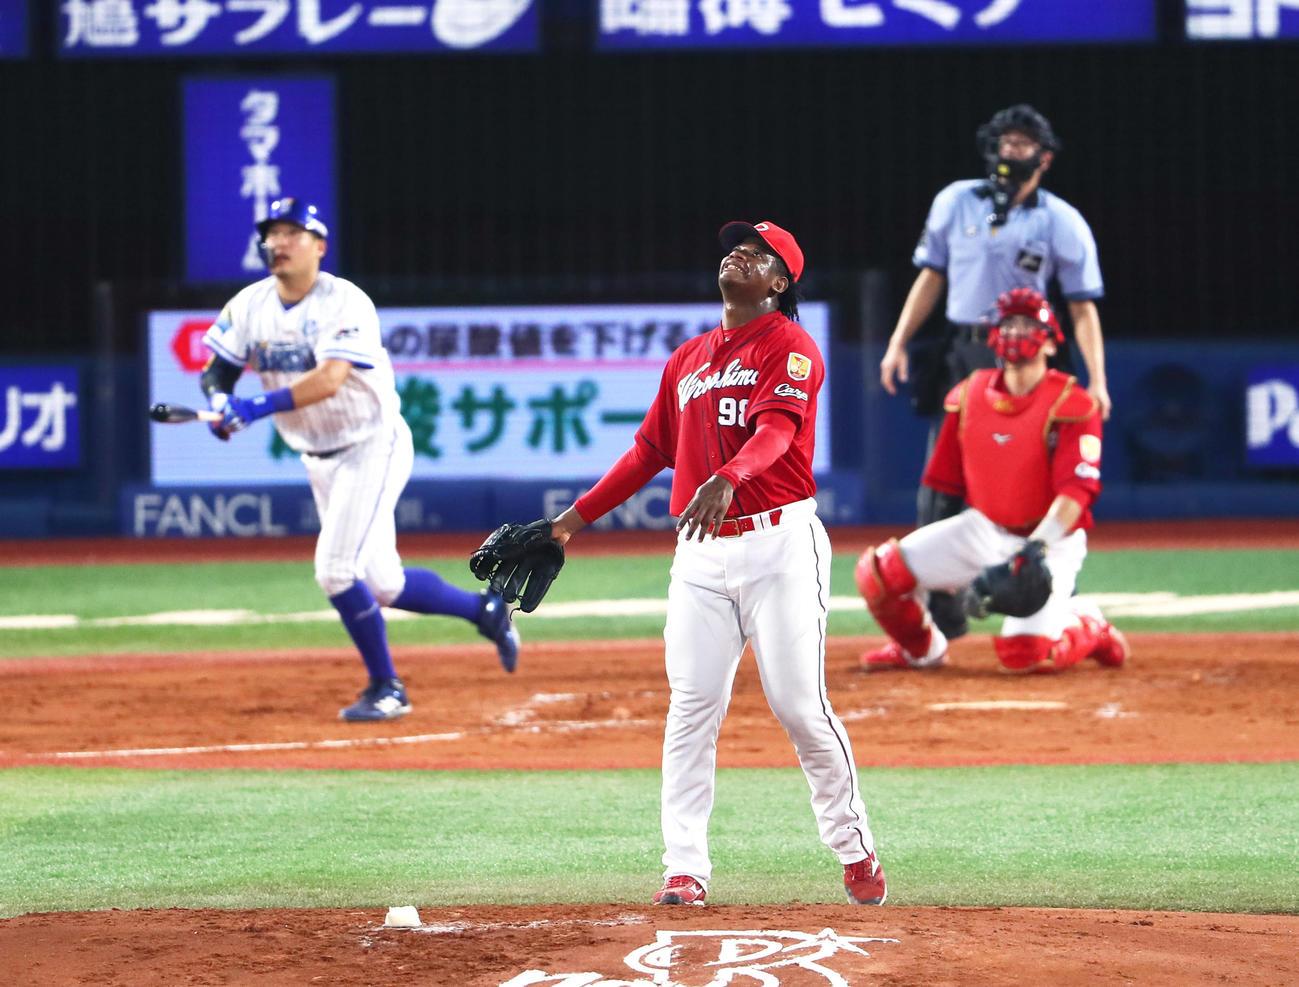 DeNA対広島 2回裏DeNA1死一塁、筒香に右越え2点本塁打を浴びるモンティージャ(2019年8月17日撮影)